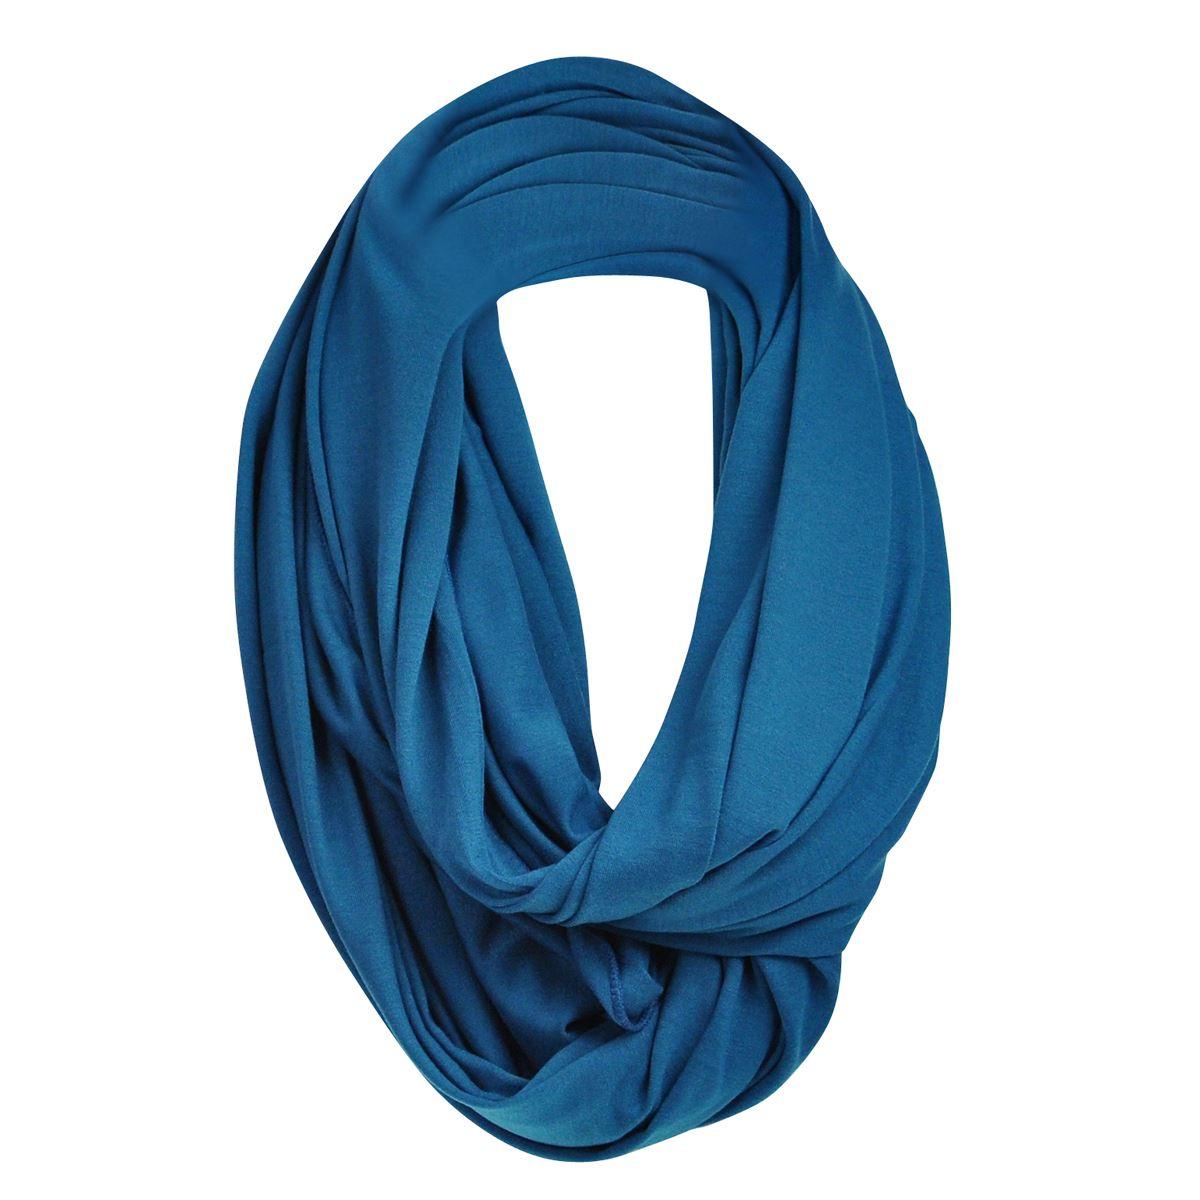 unisex jersey warm circle infinity plain snood scarf cowl